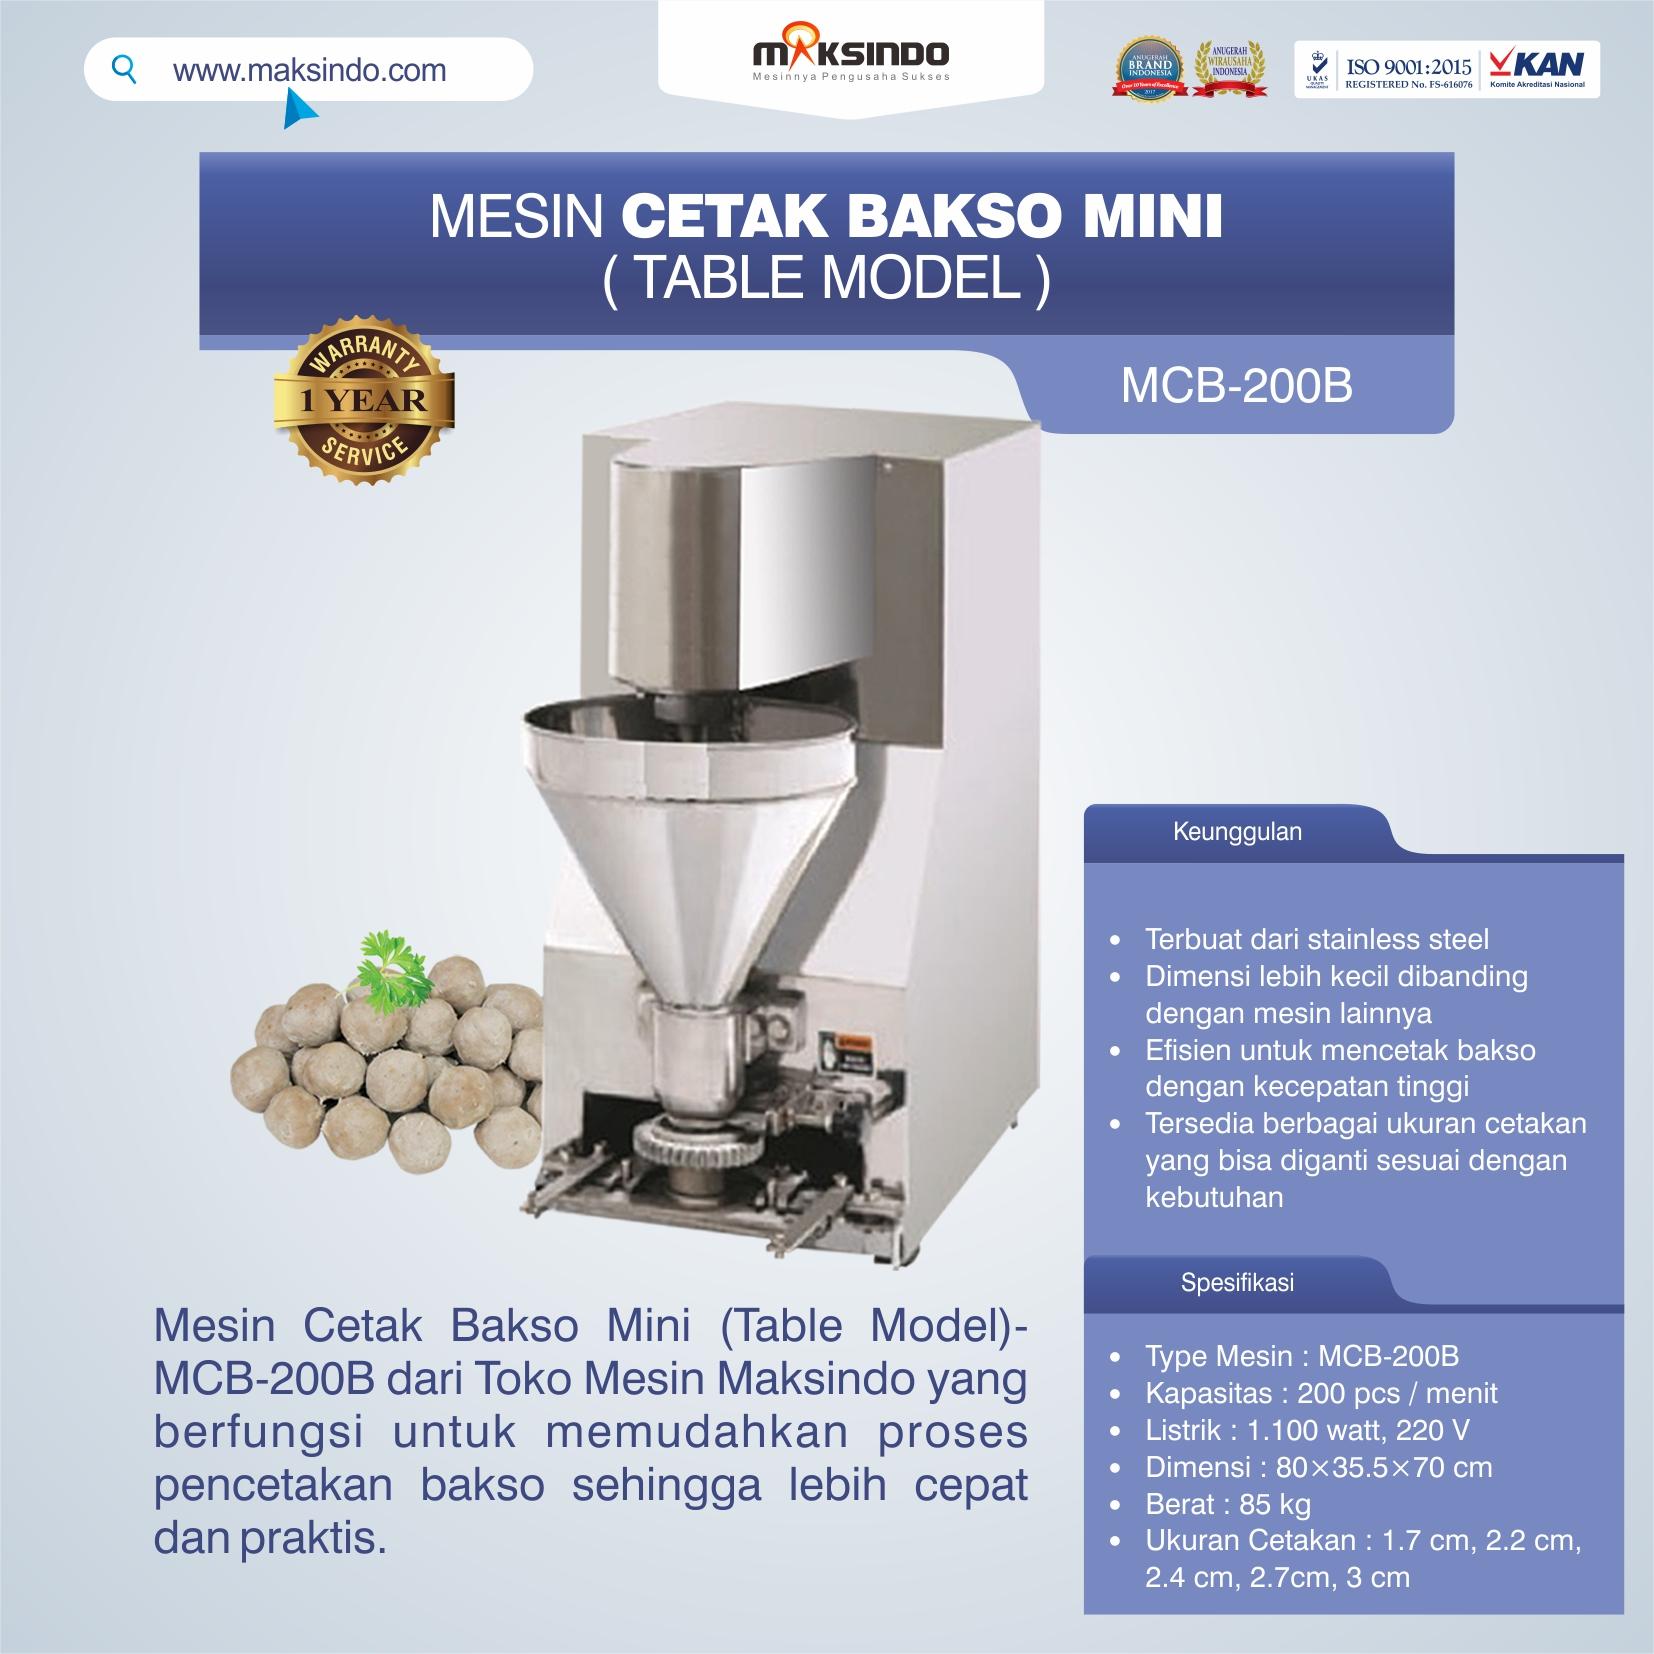 Jual Mesin Cetak Bakso Mini (Table Model) – MCB-200B di Tangerang